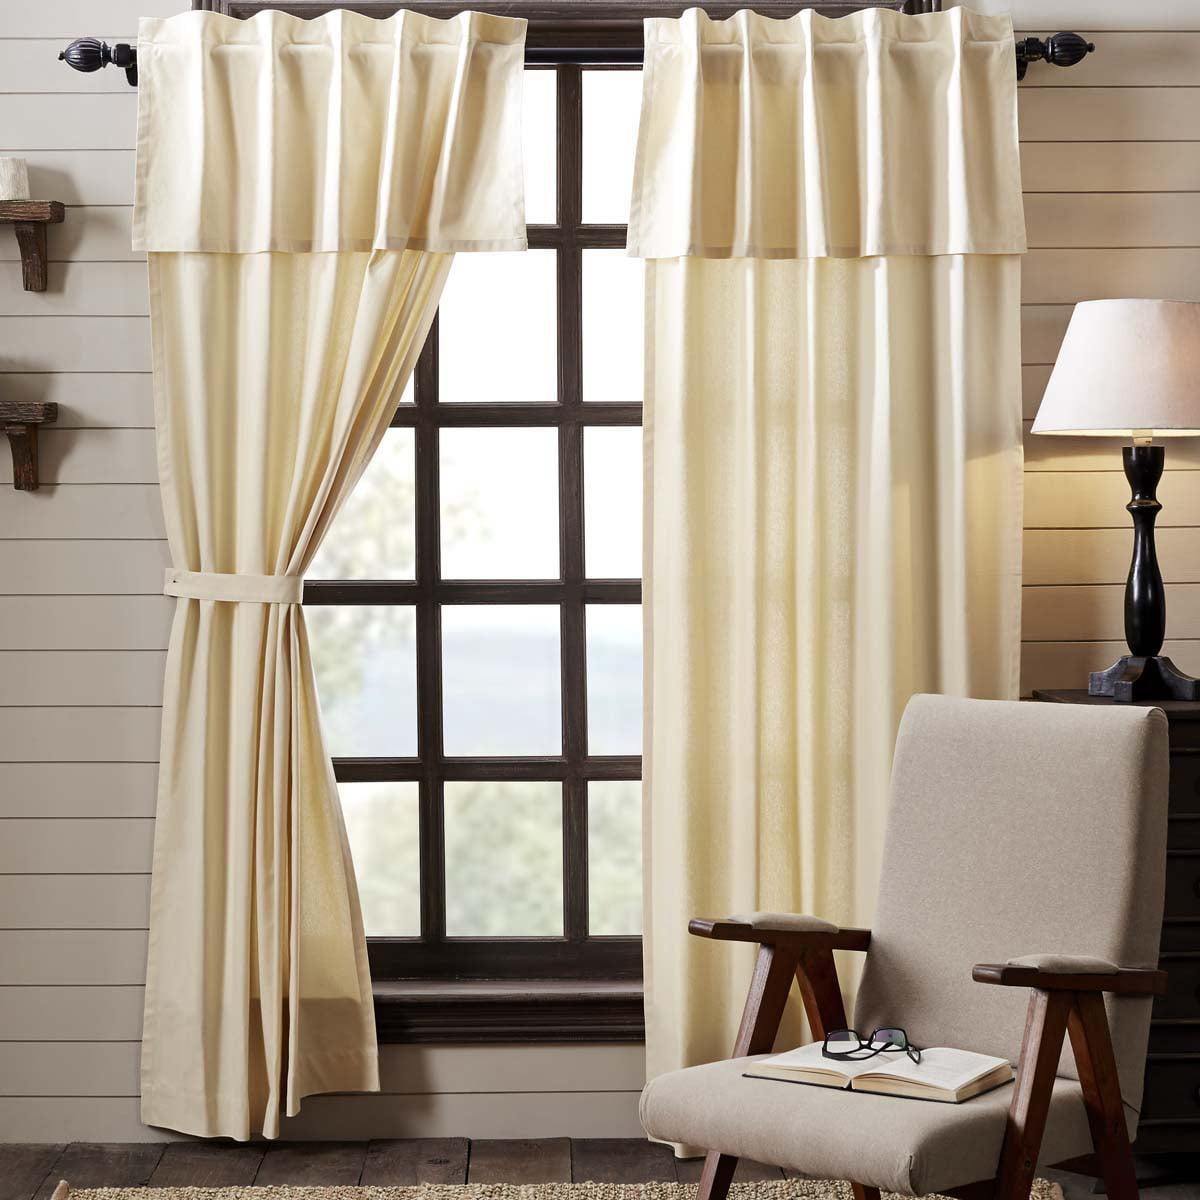 Dark Creme Tan Farmhouse Curtains Sonnet Rod Pocket Cotton